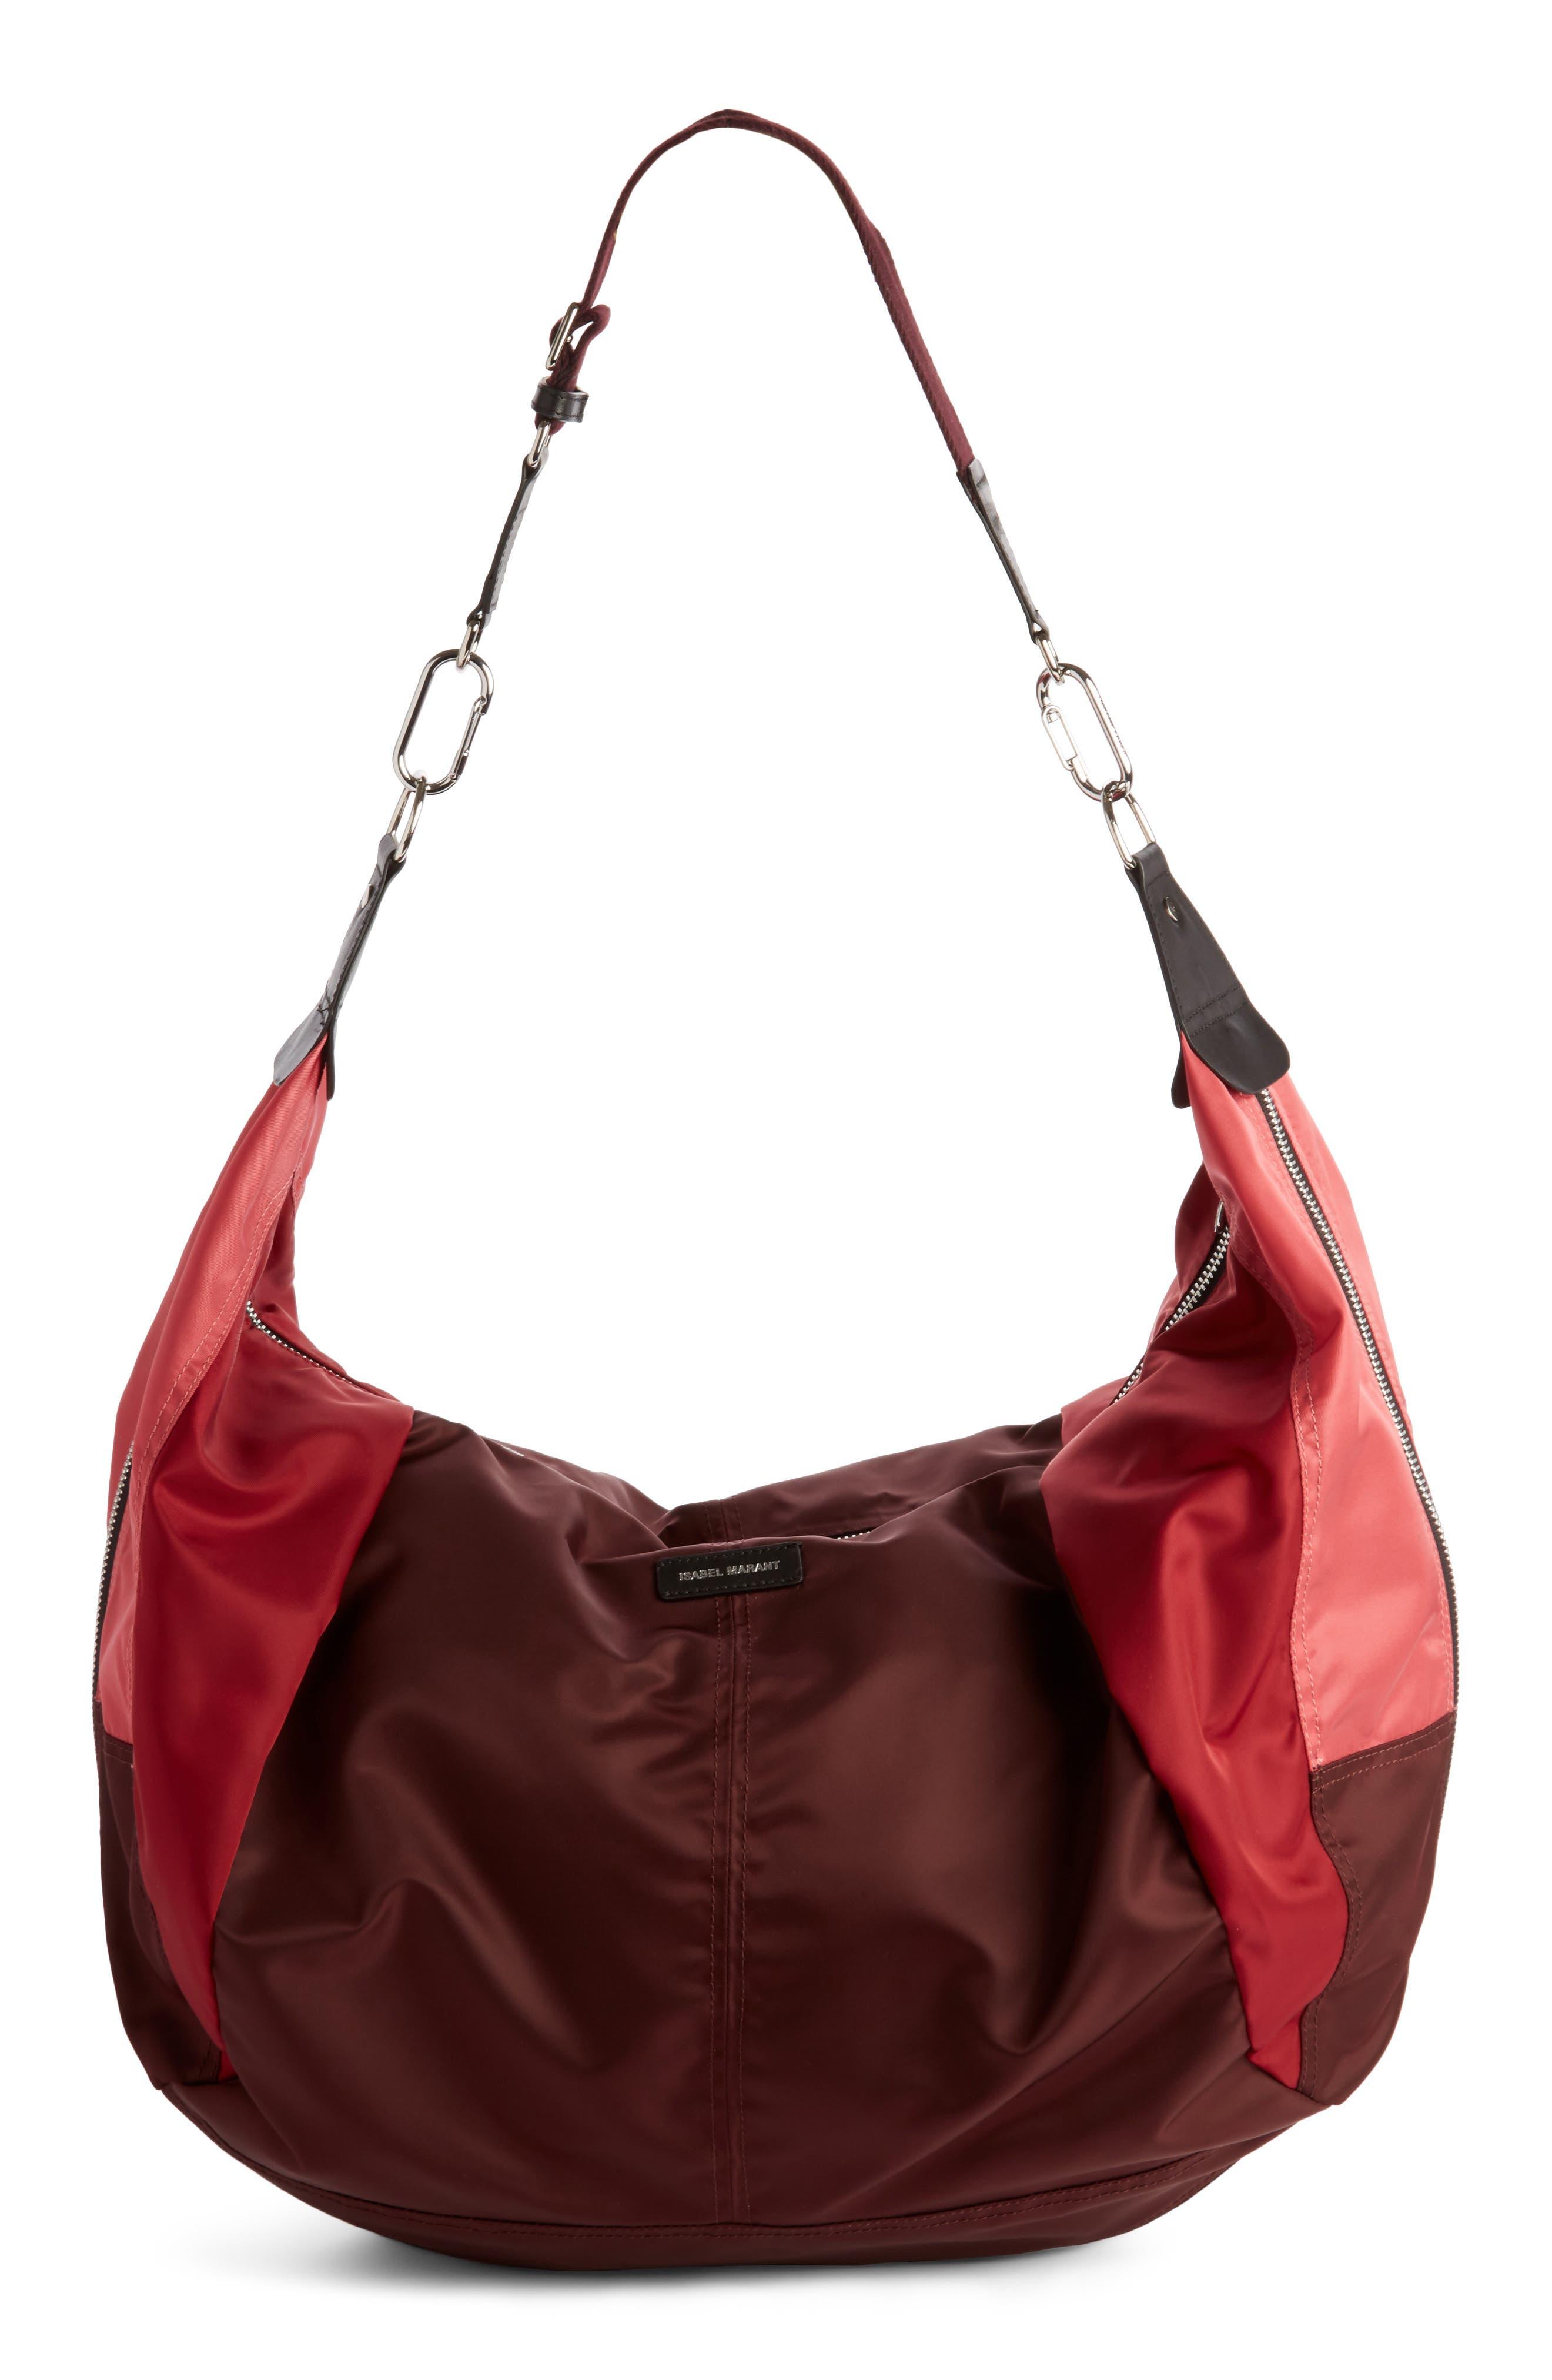 Isabel Marant Lieven Large Weekend Bag